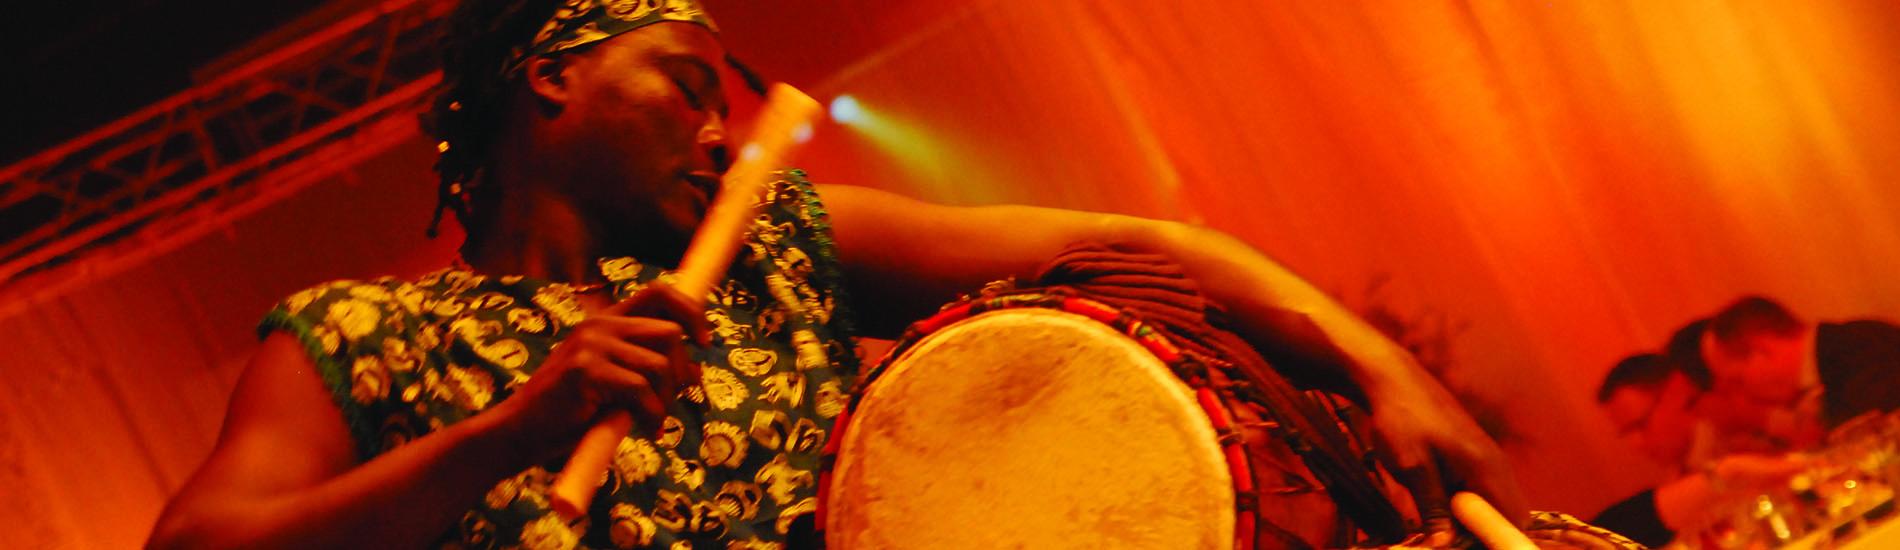 Afrikaanse percussiegroep mam bambe HEADER 1